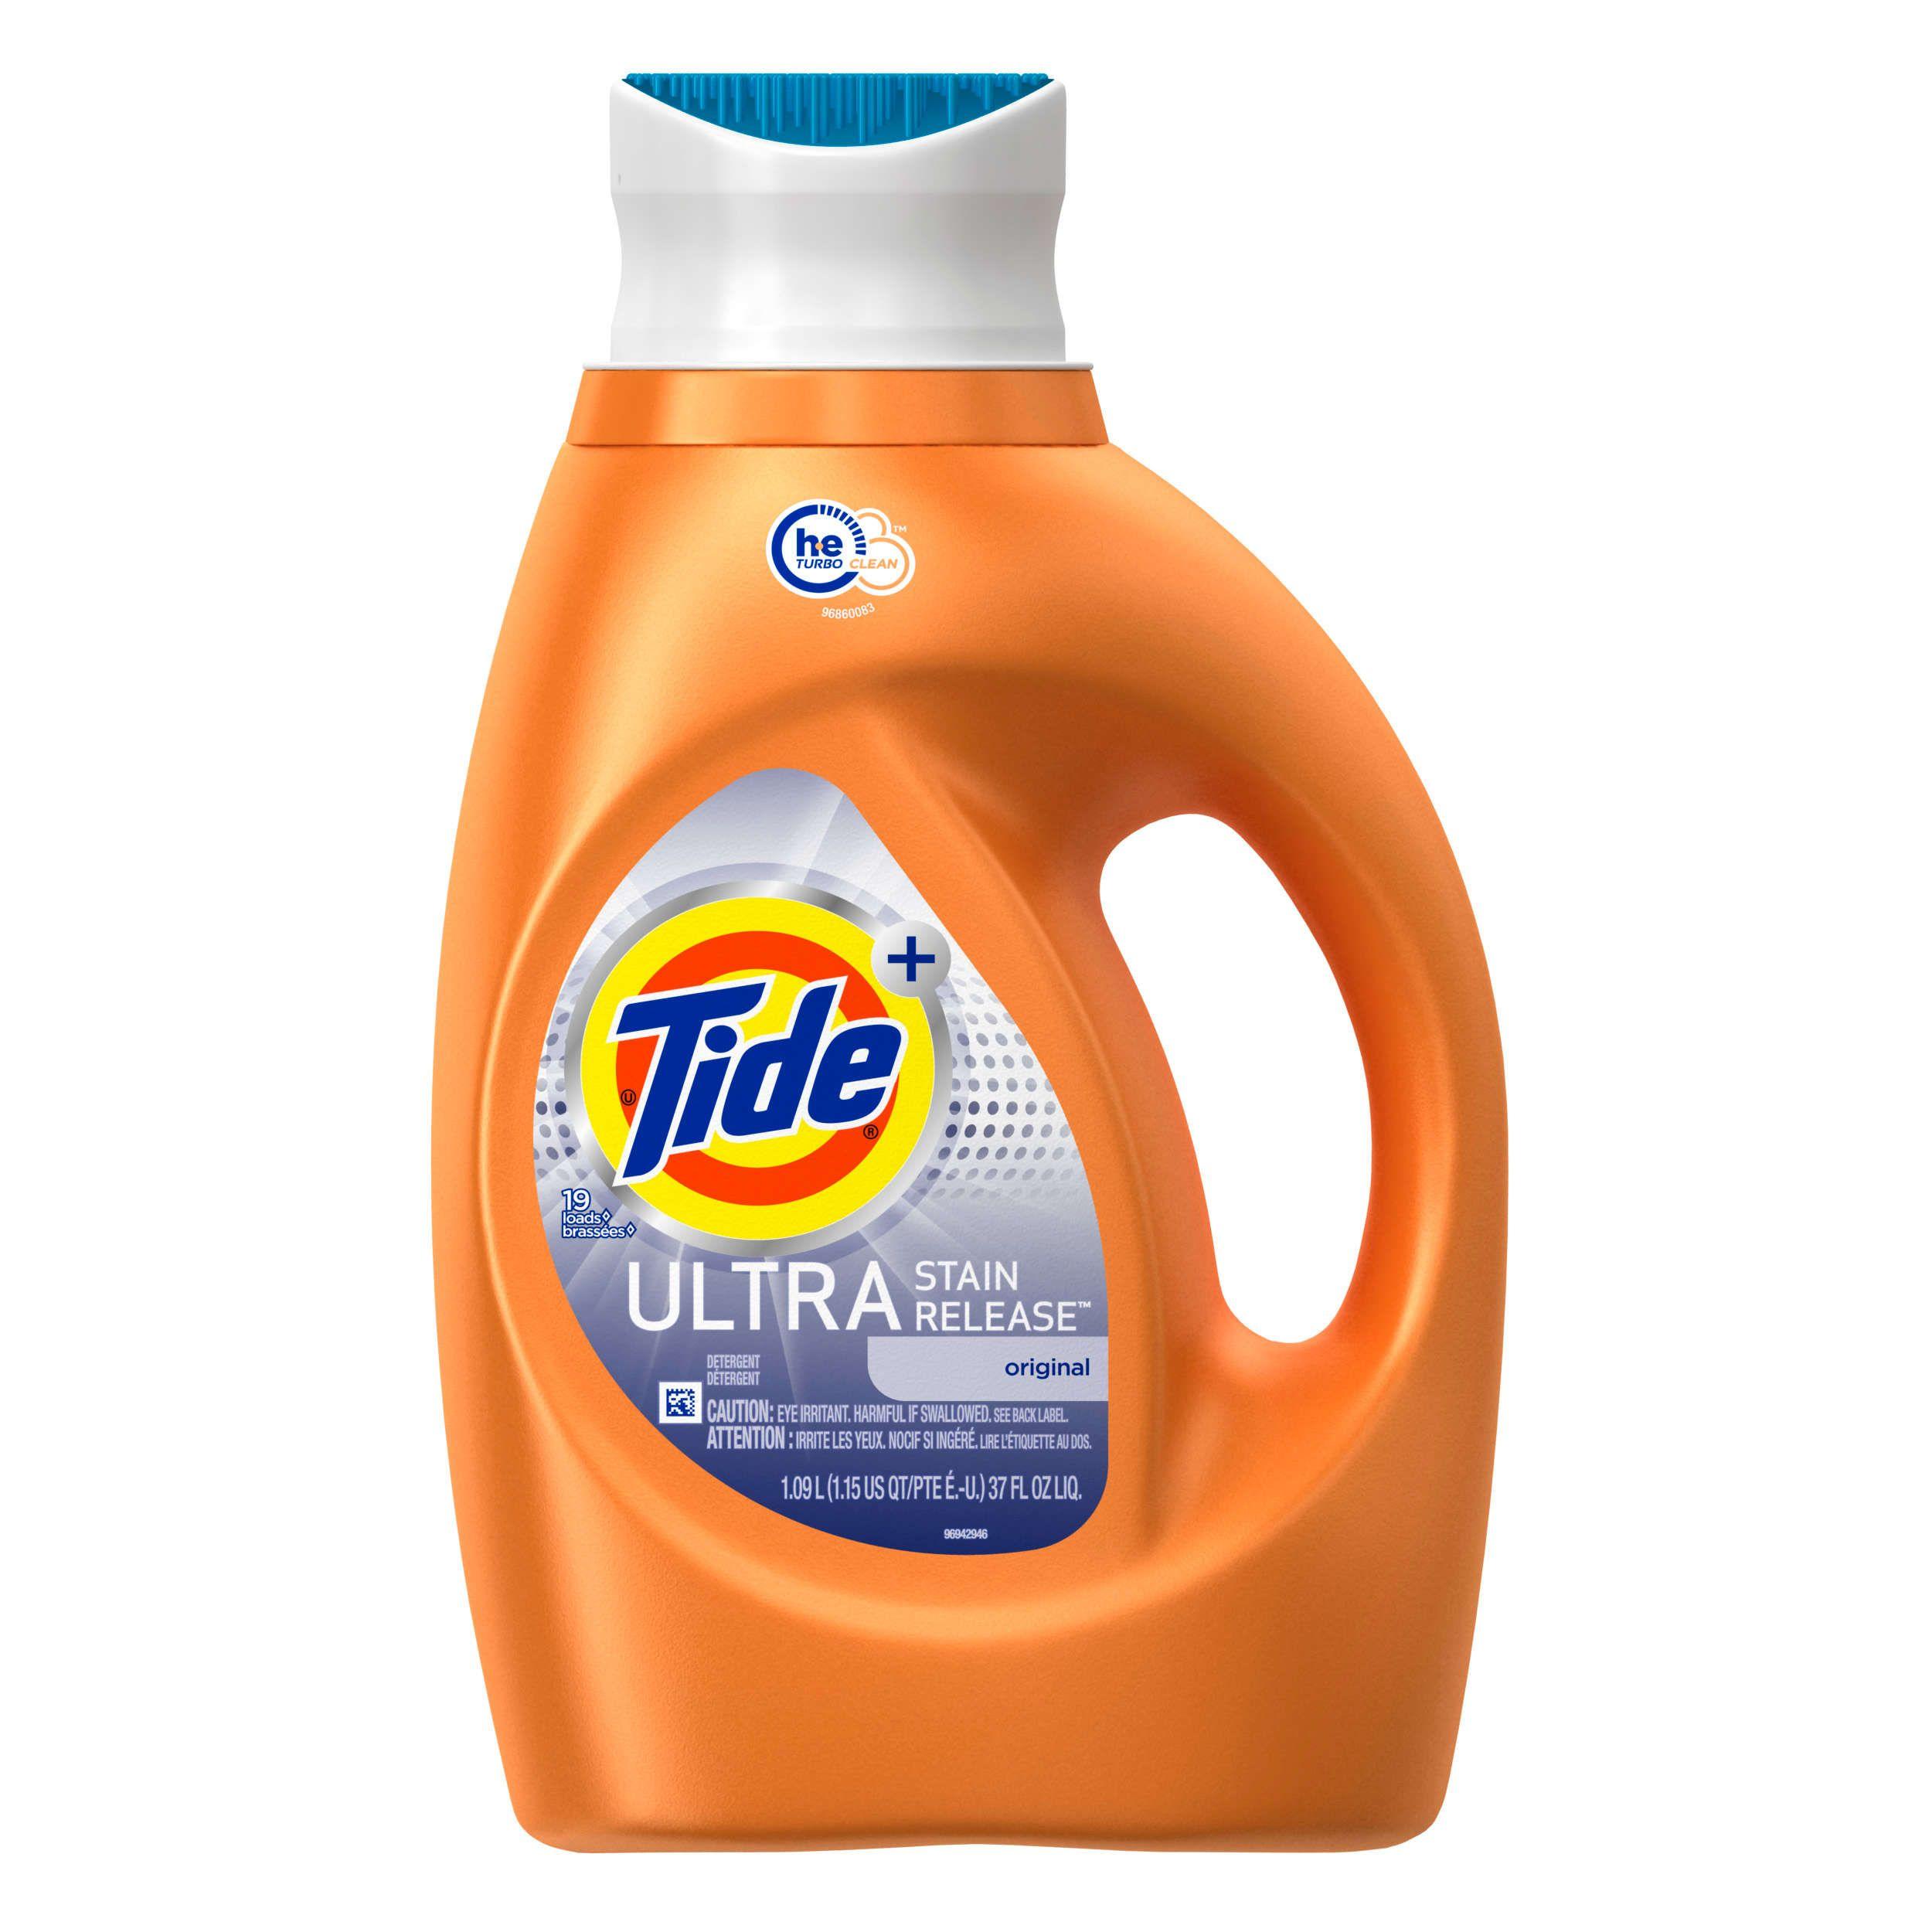 View Tide Tide Ultra Stain Release HE Turbo Clean Liquid